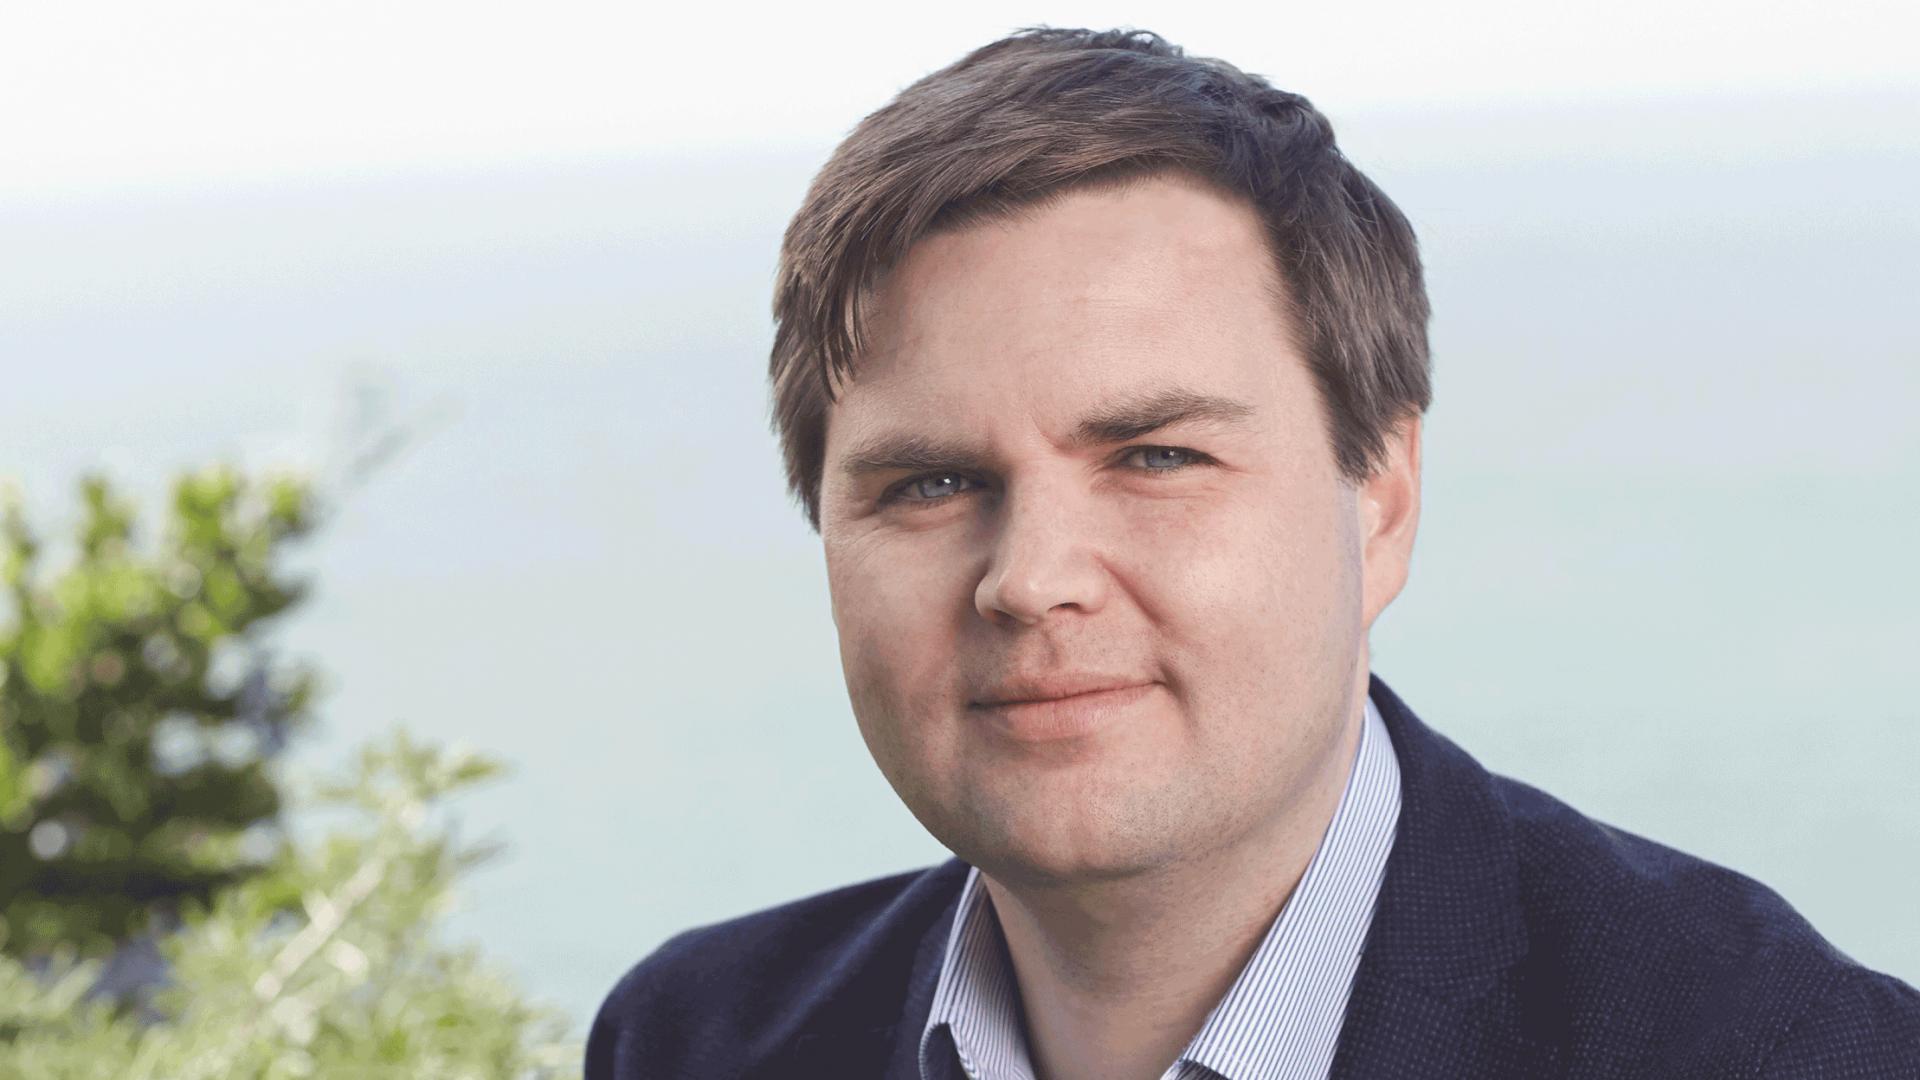 Venture capitalist and author J.D. Vance